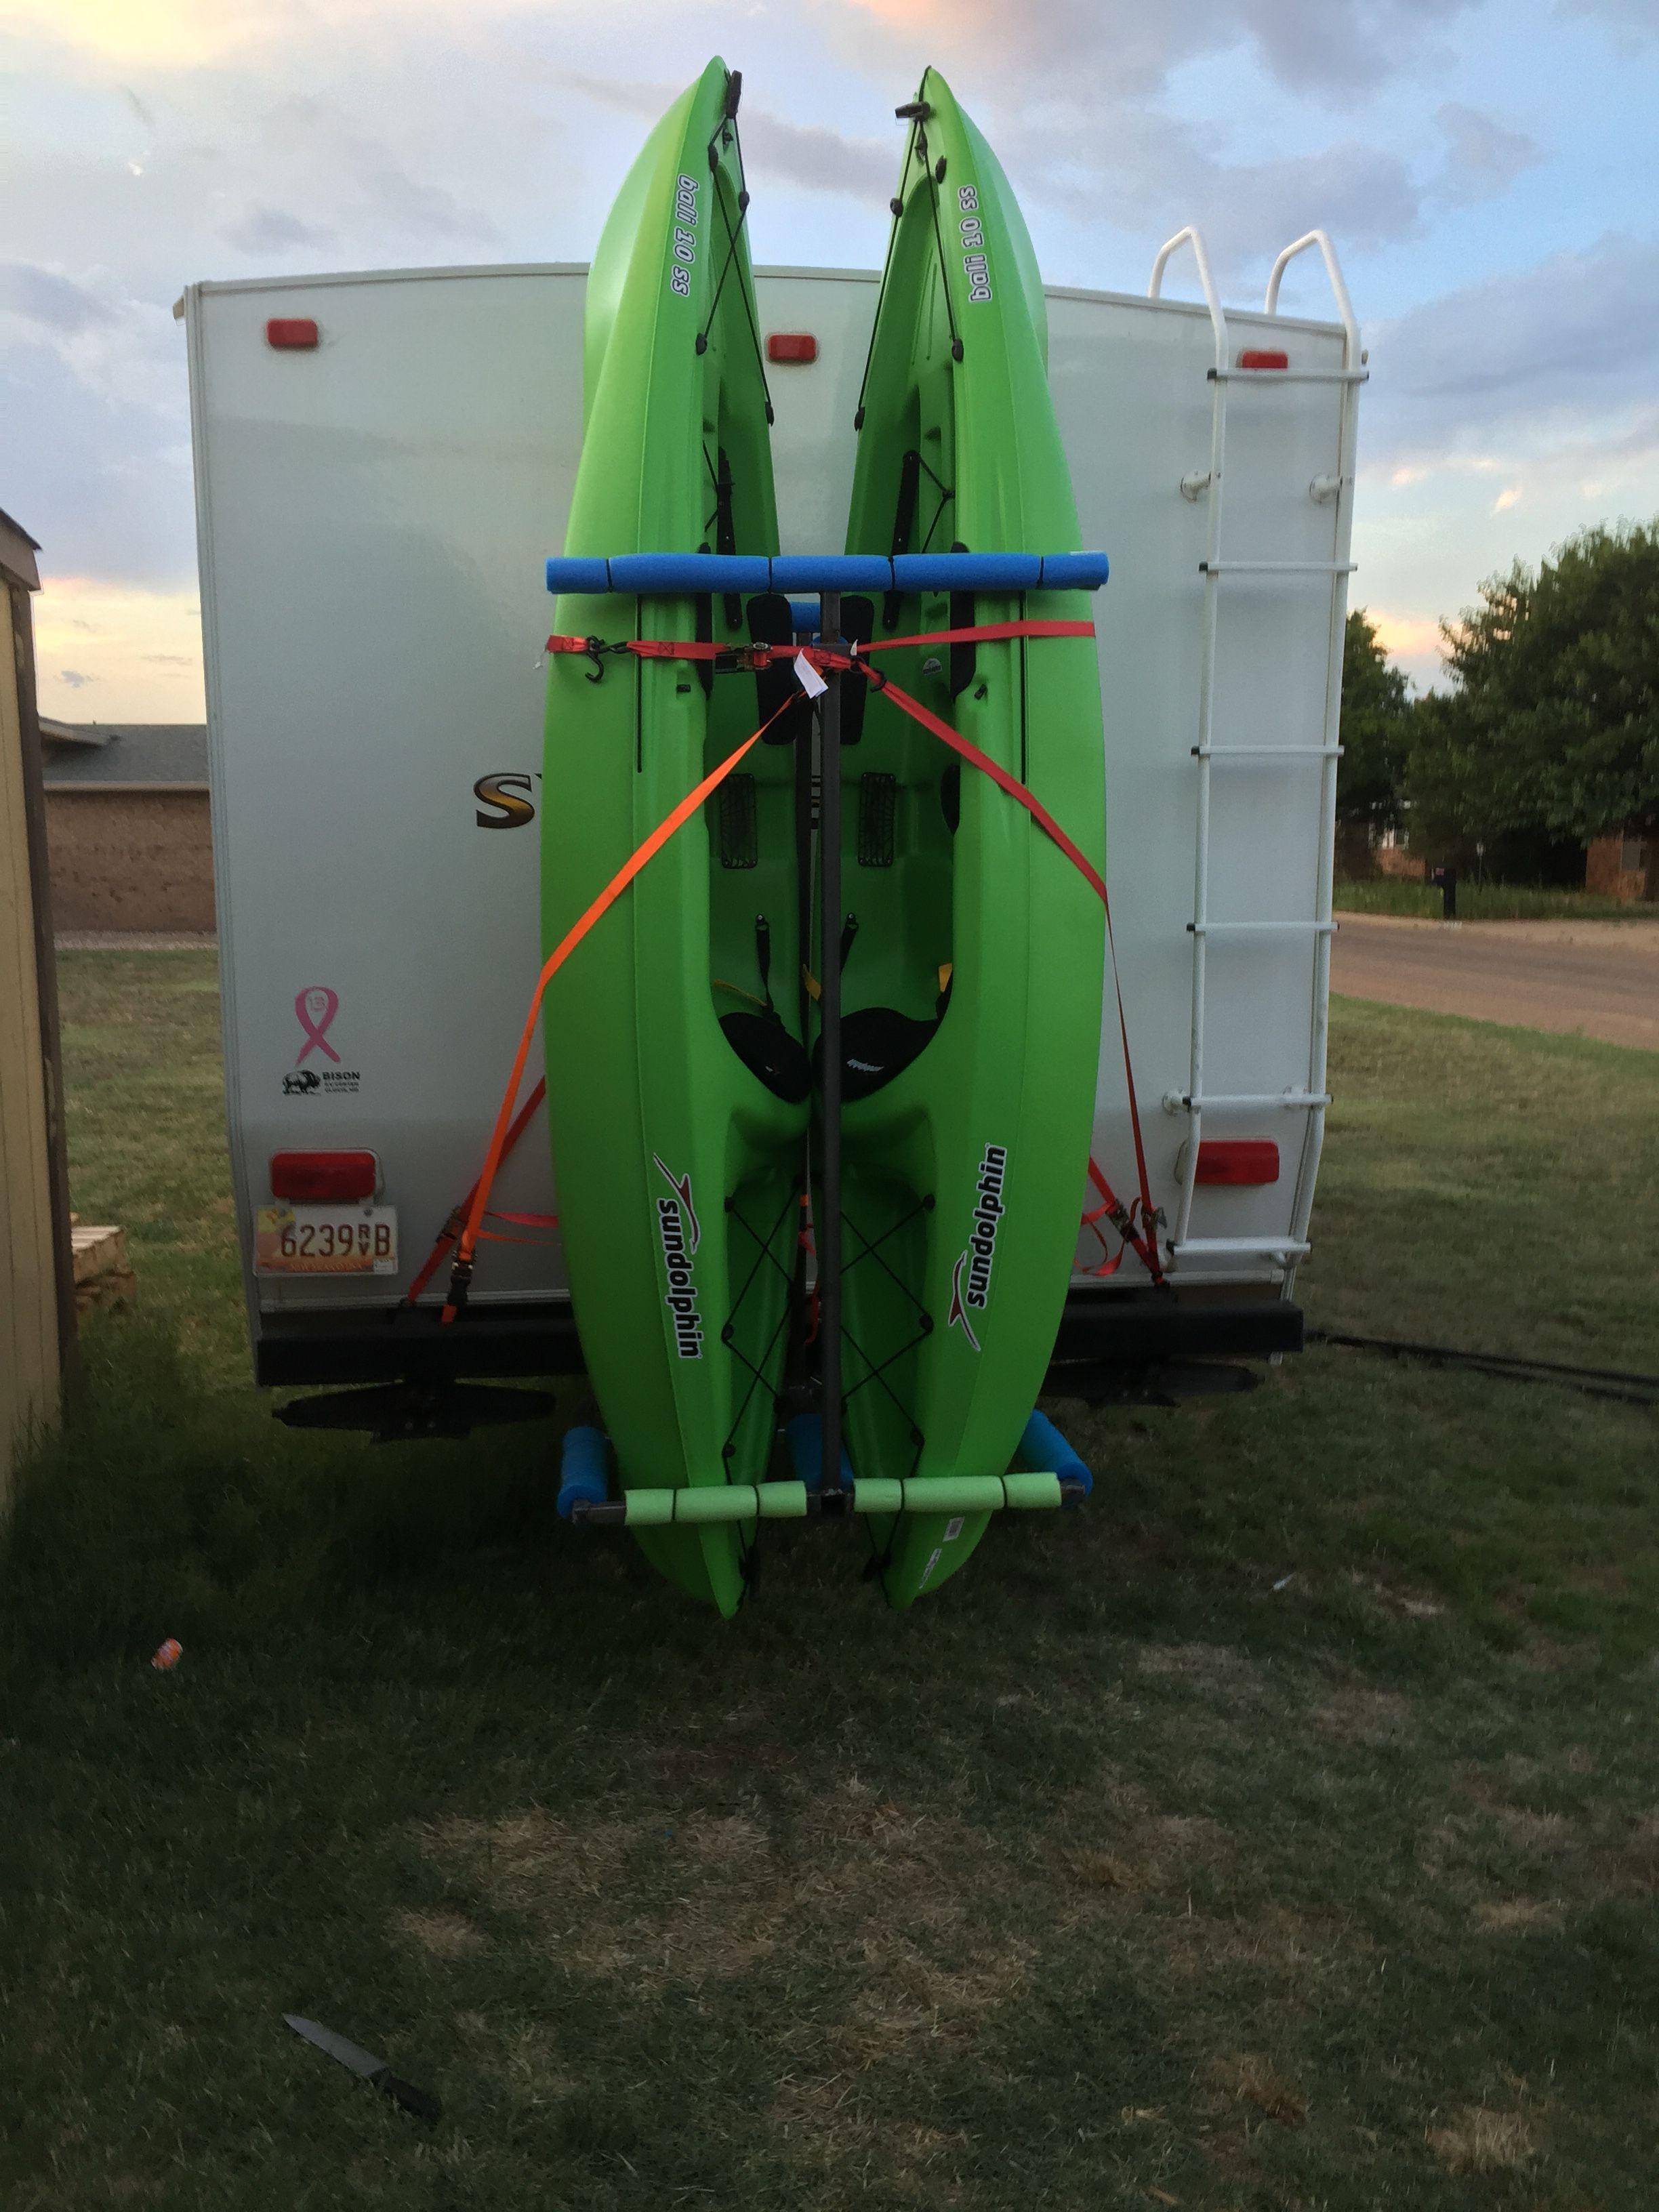 DIY Vertical Kayak Rack For Rv  Pin by Lisa Langtimm Leos on Kayak Stuff